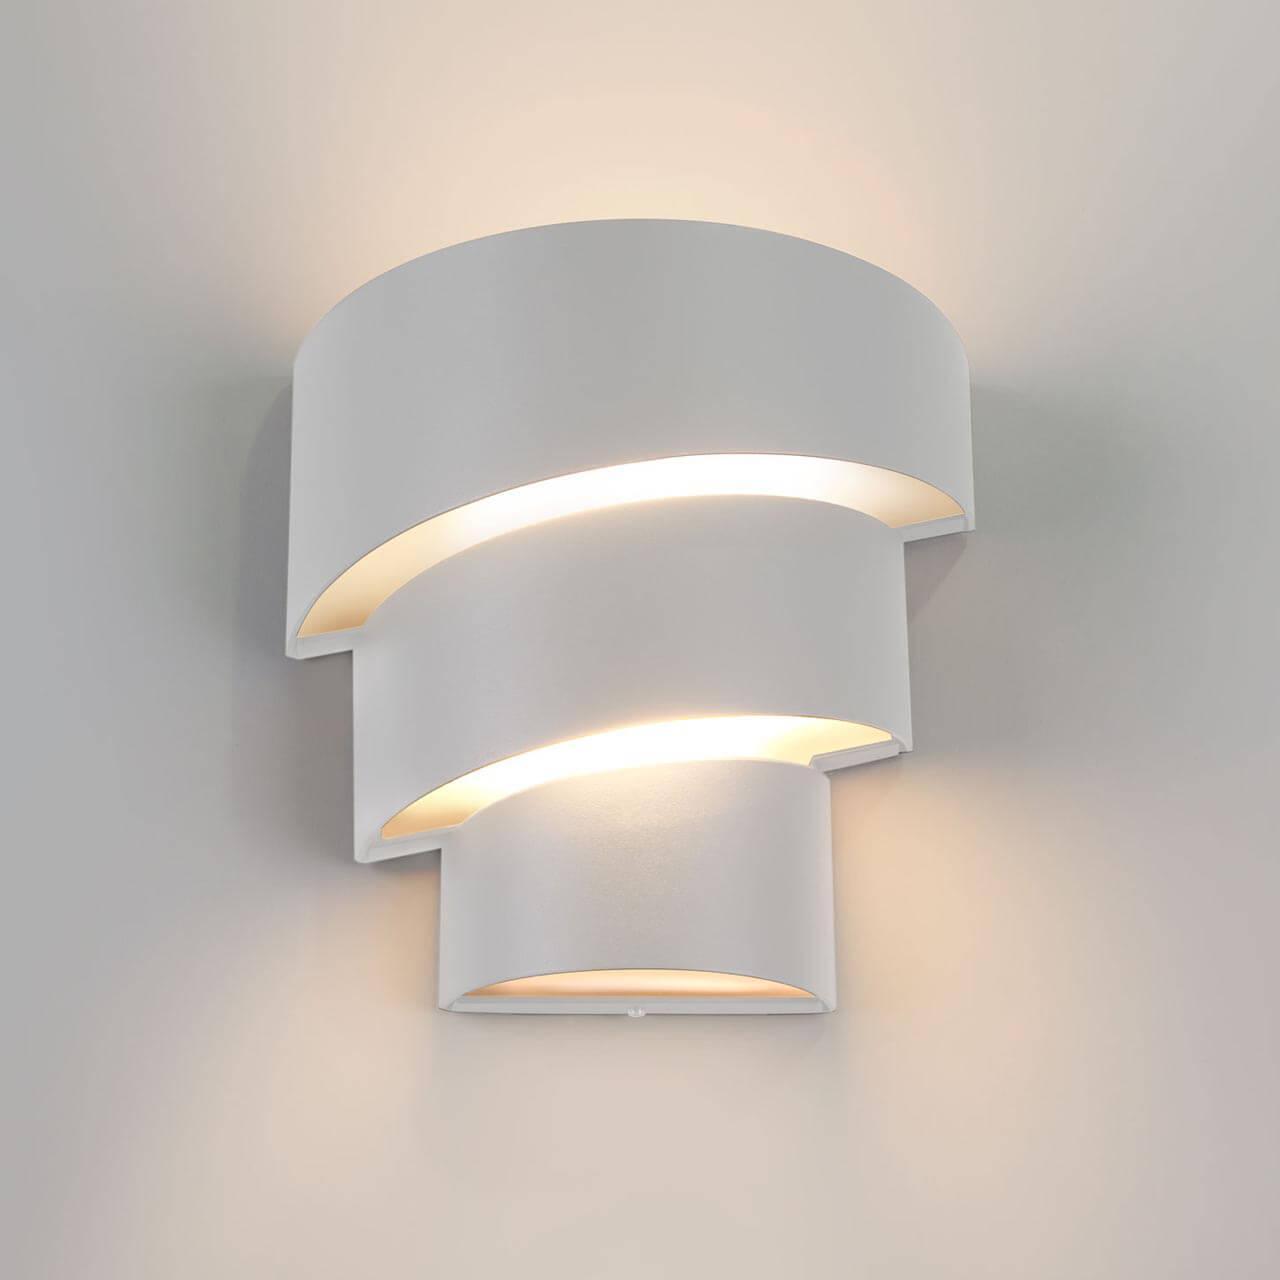 Уличный светильник Elektrostandard 4690389116025, LED уличный настенный светодиодный светильник elektrostandard 1605 techno led sokar графит 4690389086038